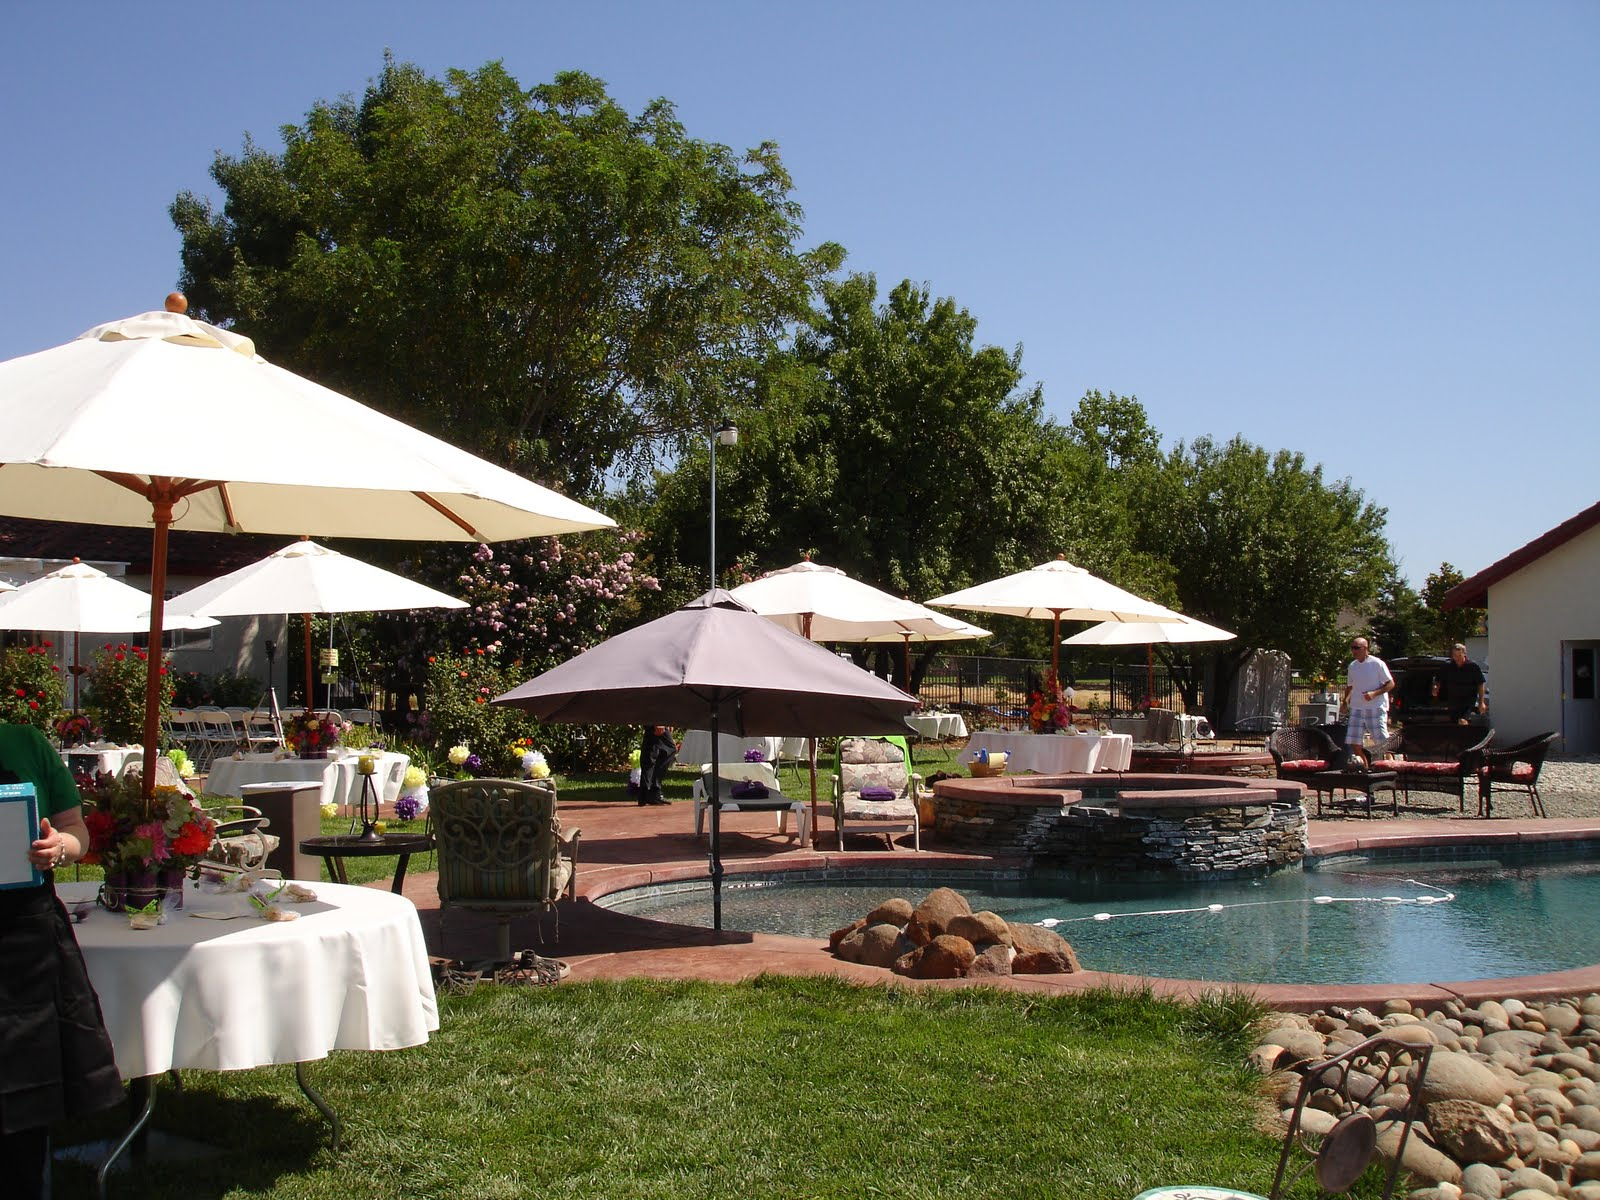 The ABCs of Wedding Planning: Backyard Pool Party Wedding